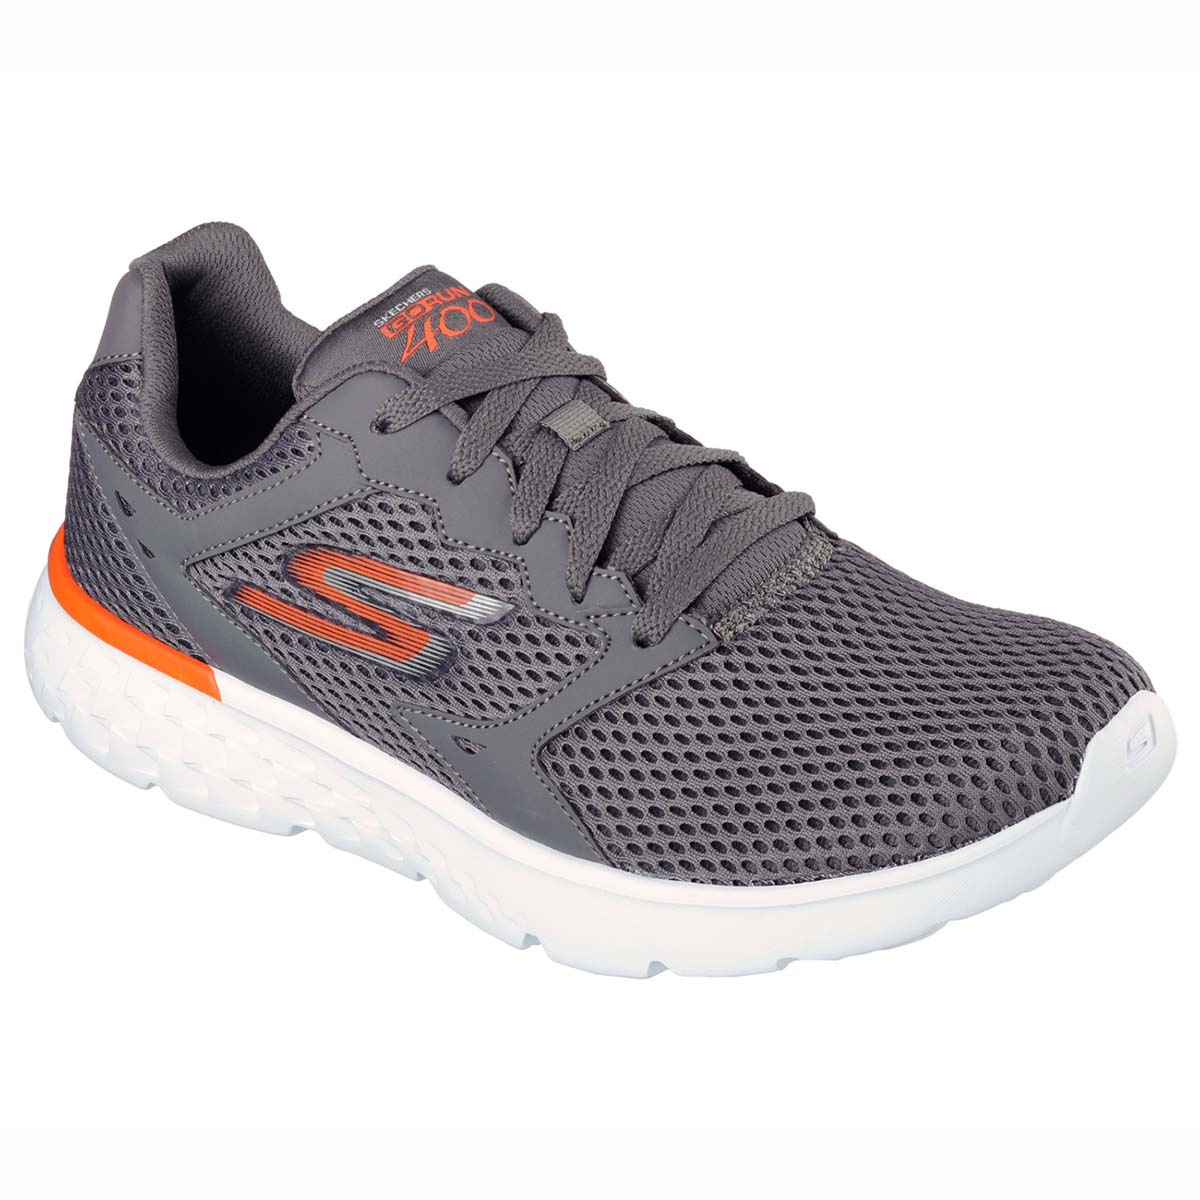 skechers shoes running